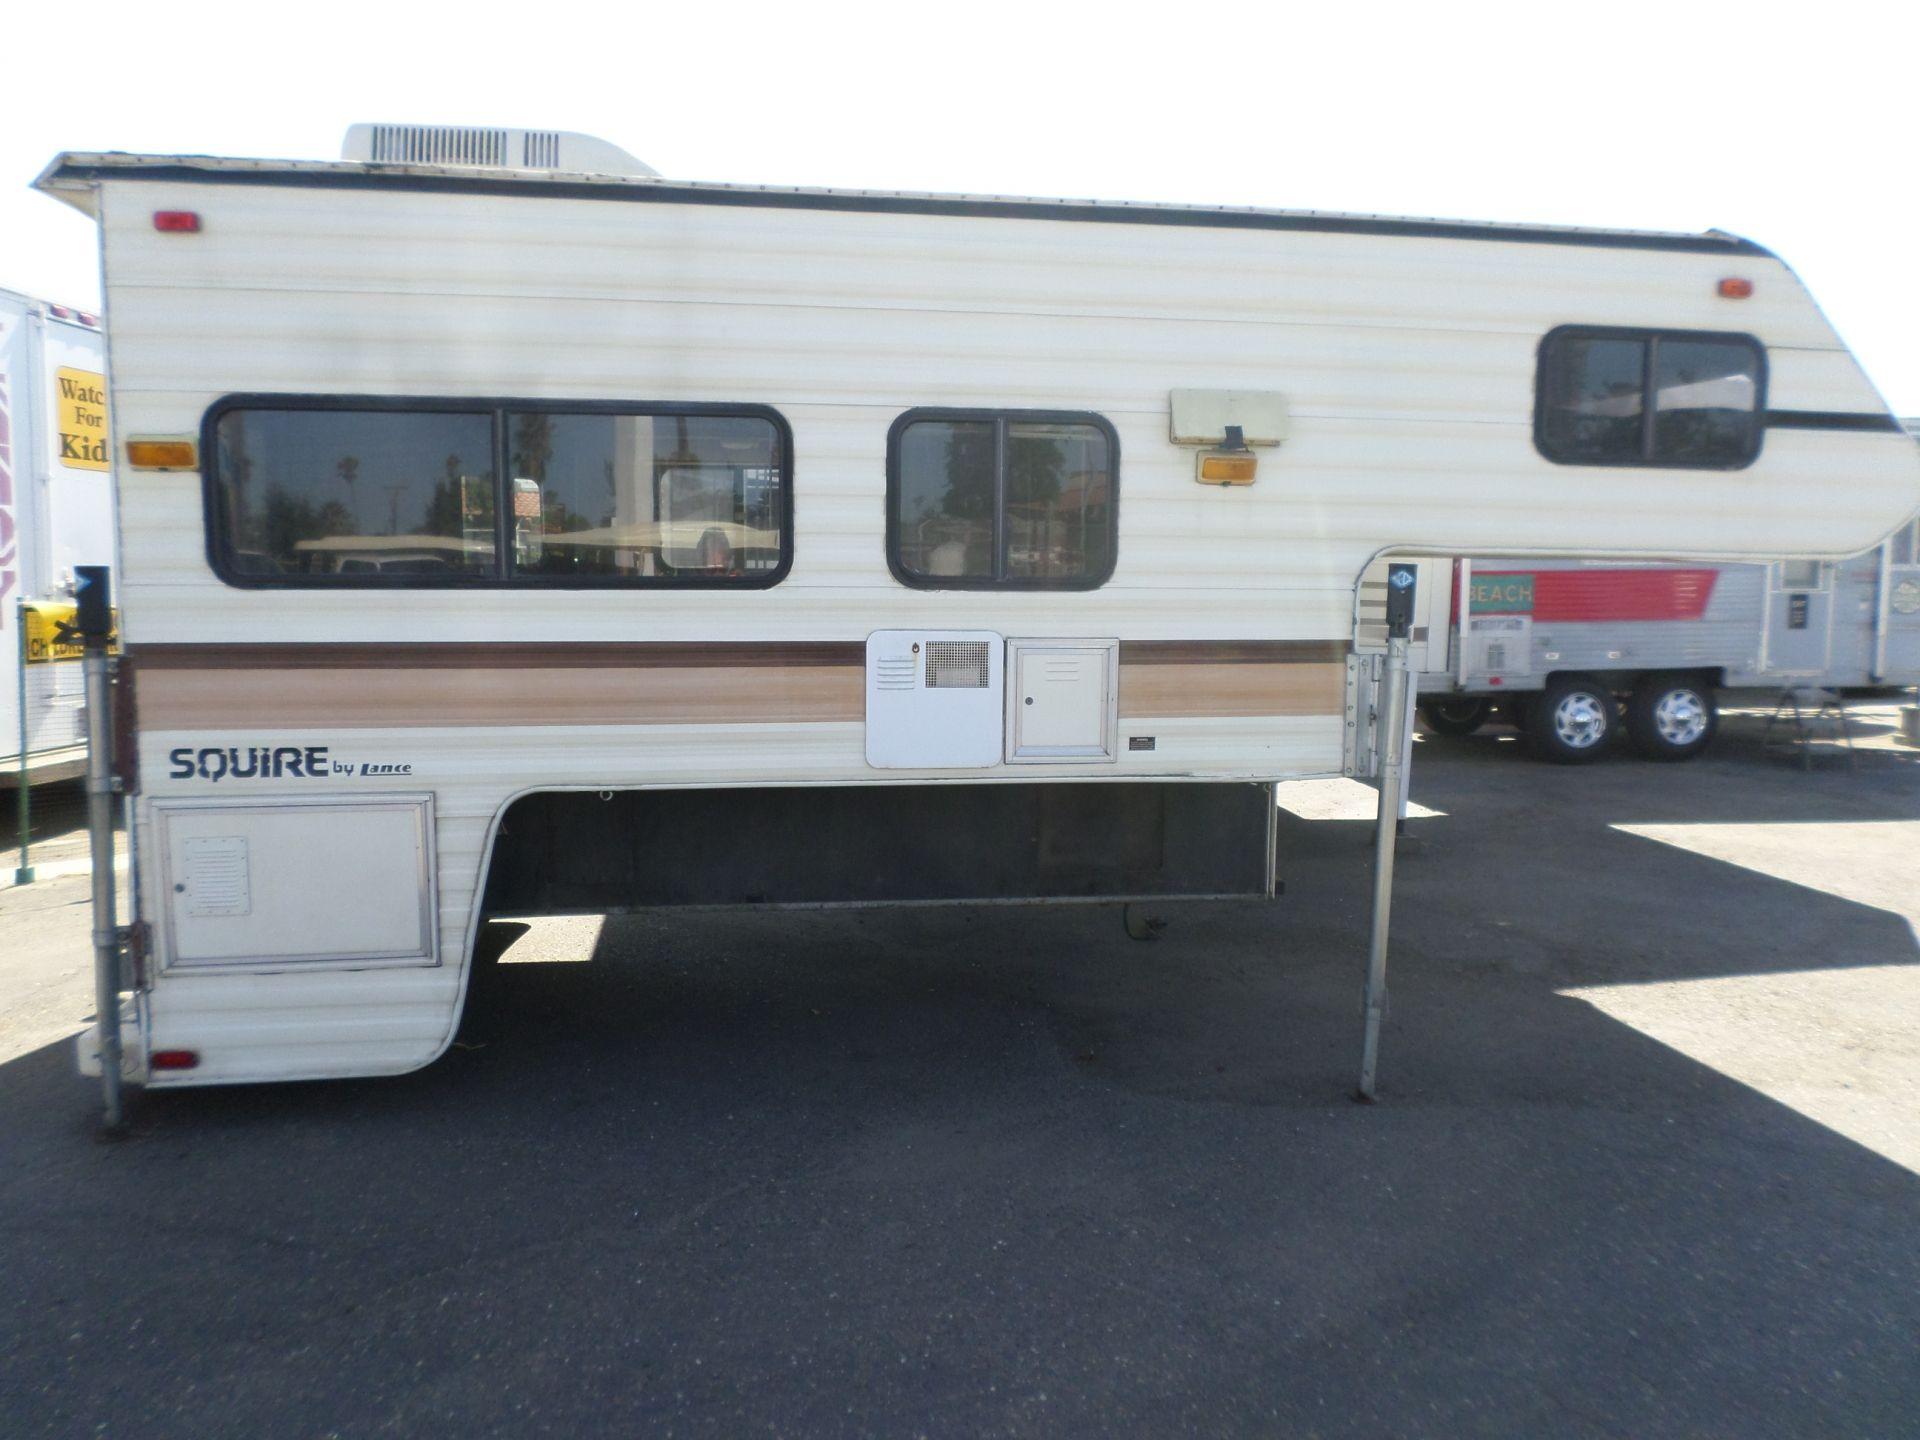 1991 Lance Squire Cabover Camper Cabover camper, Rv for